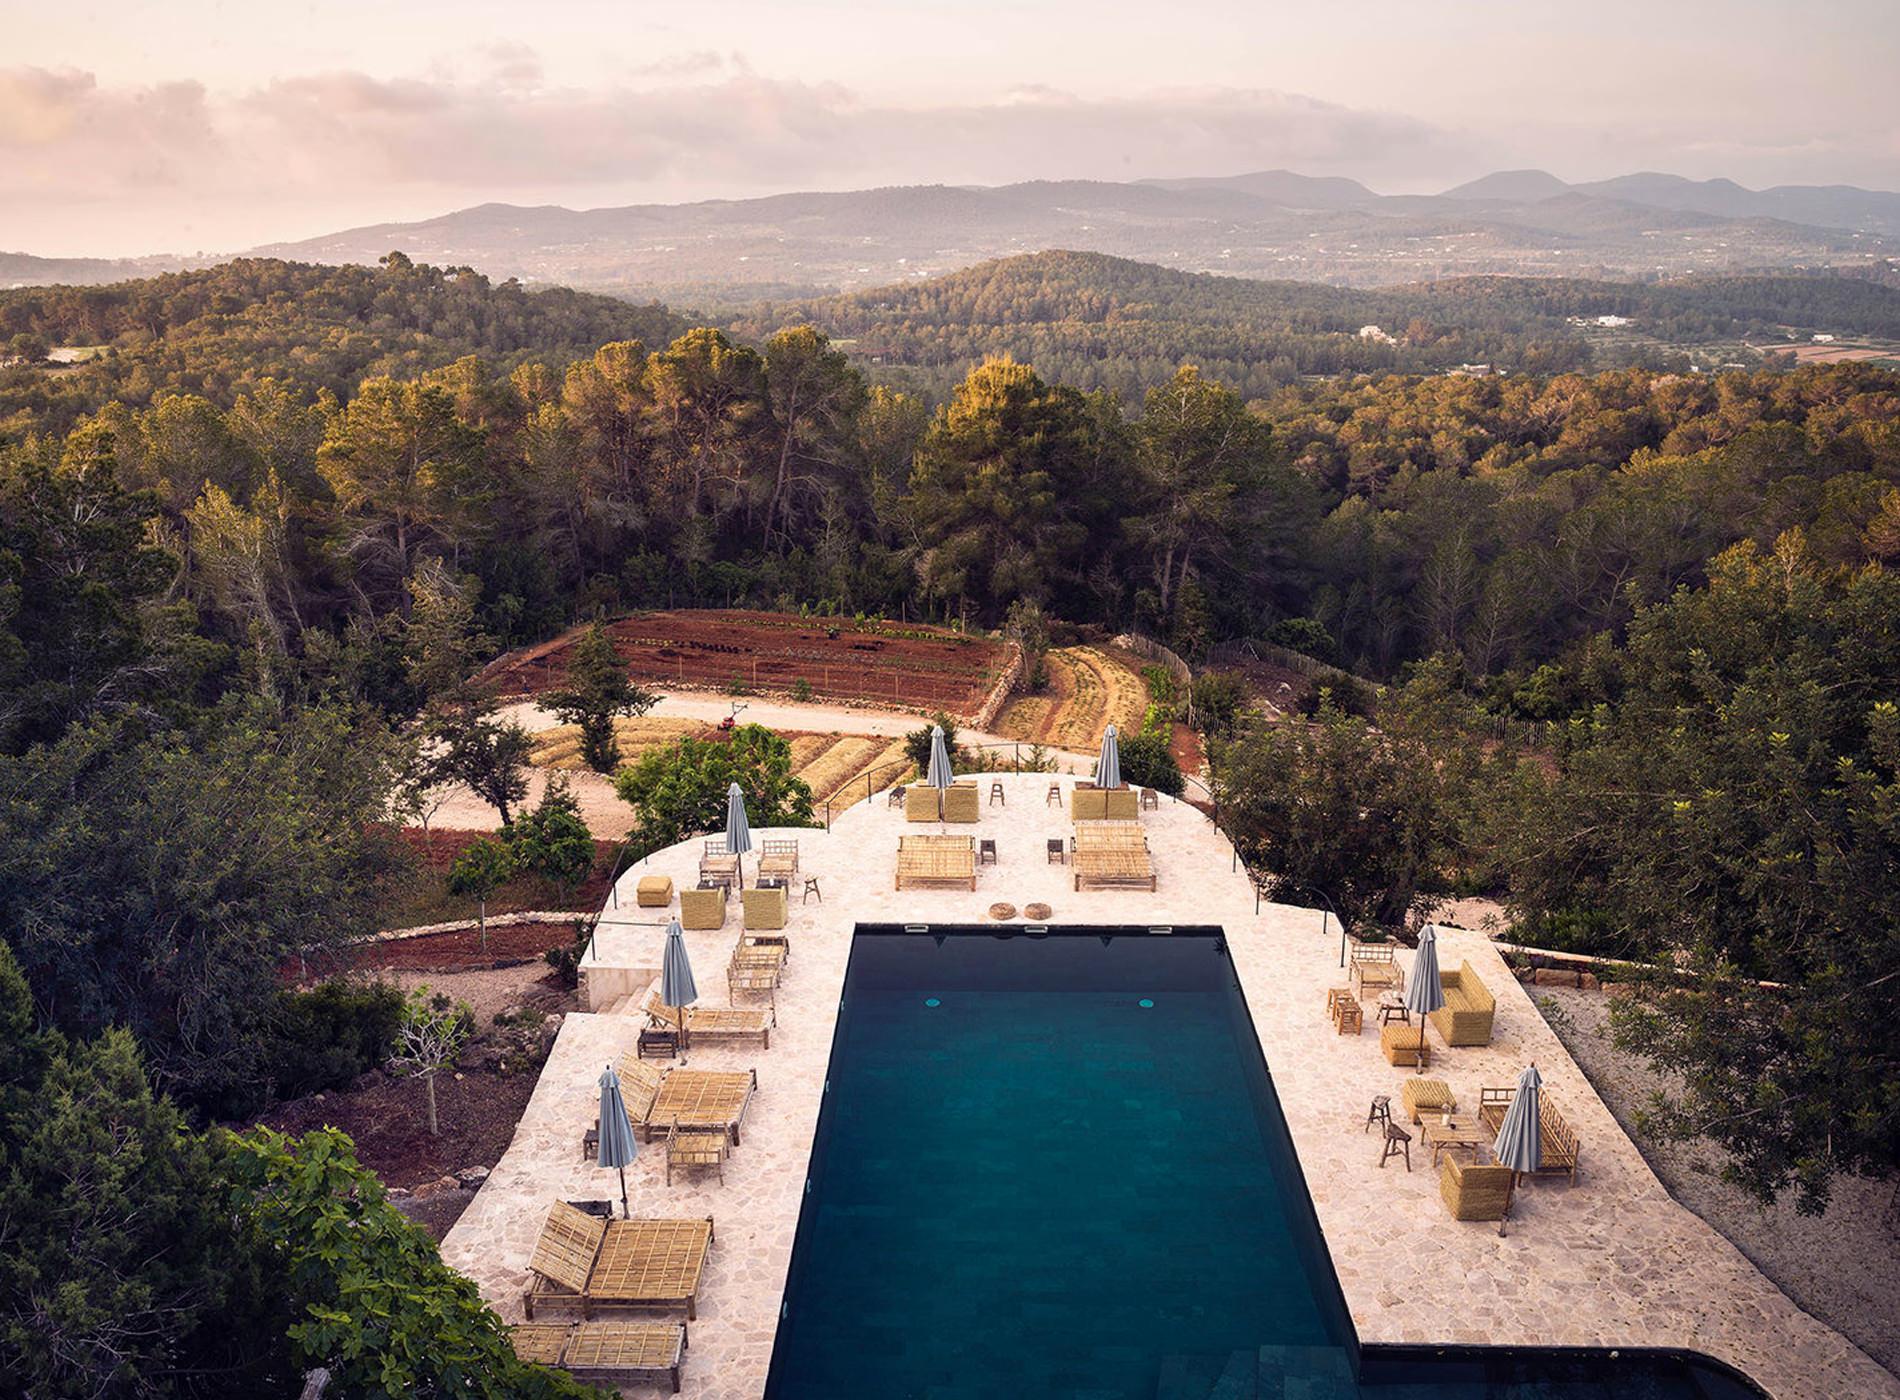 La Granja Ibiza Hotel Design Hotels Espagne Paysages